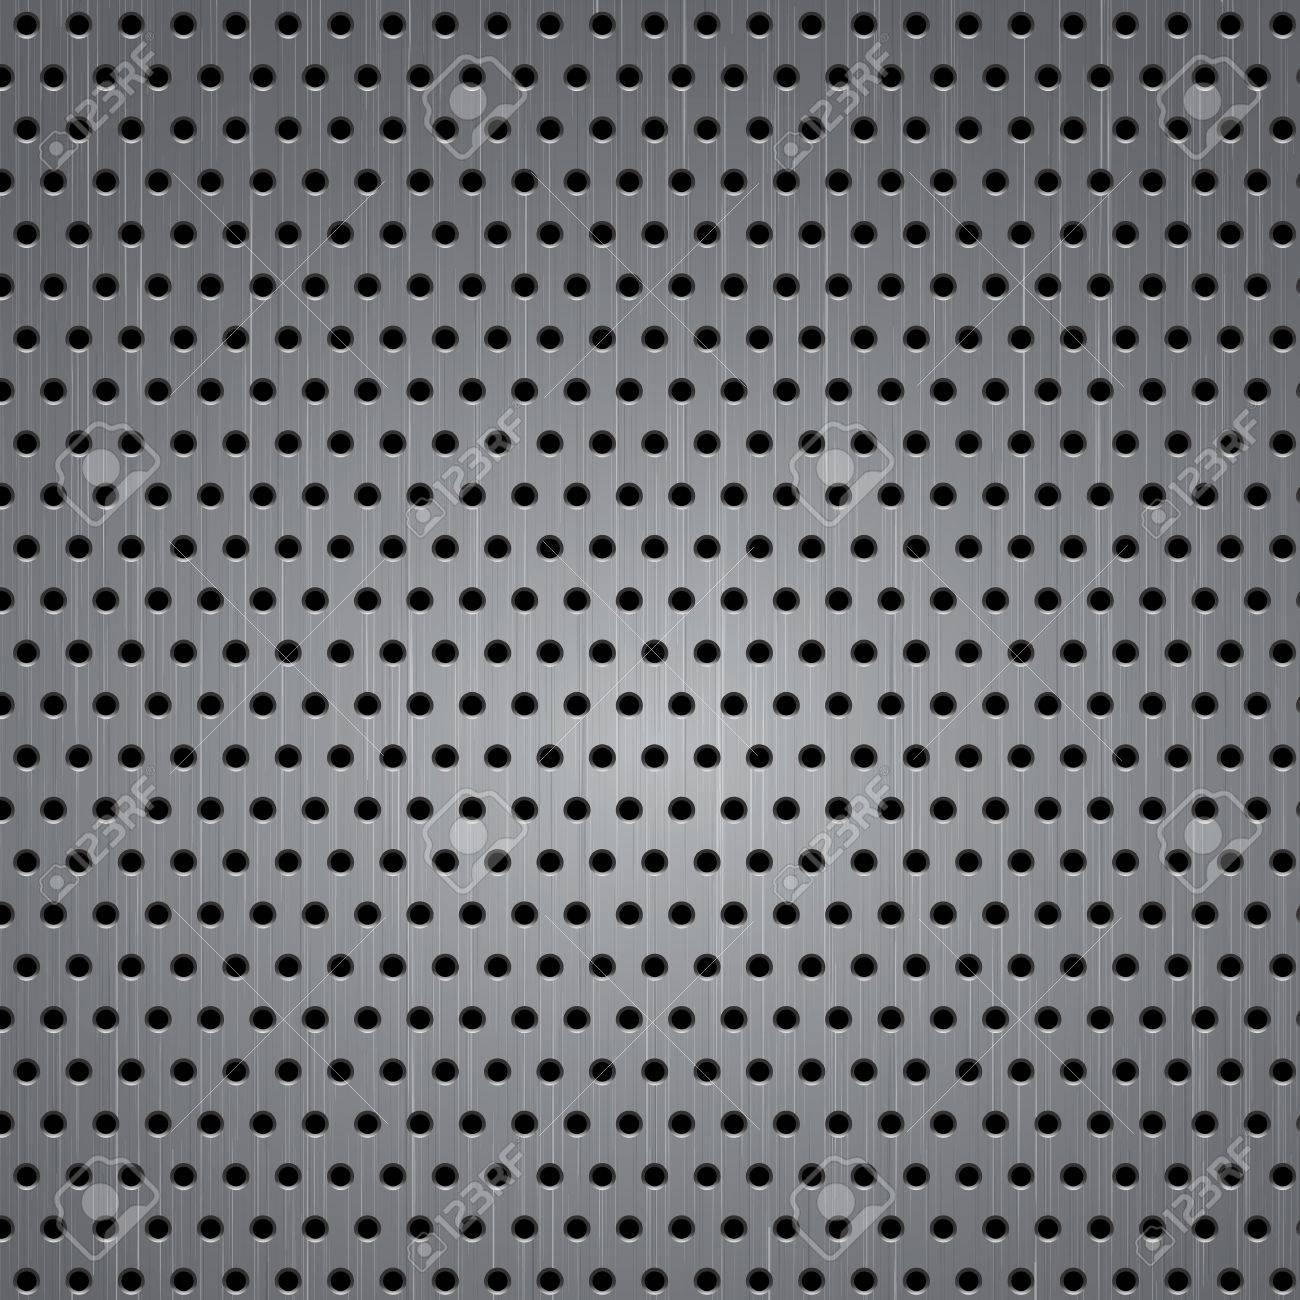 Seamless metal texture background Vector Stock Vector 14703043  Seamless  Metal Texture Background Vector Royalty Free. Free Seamless Metal Textures